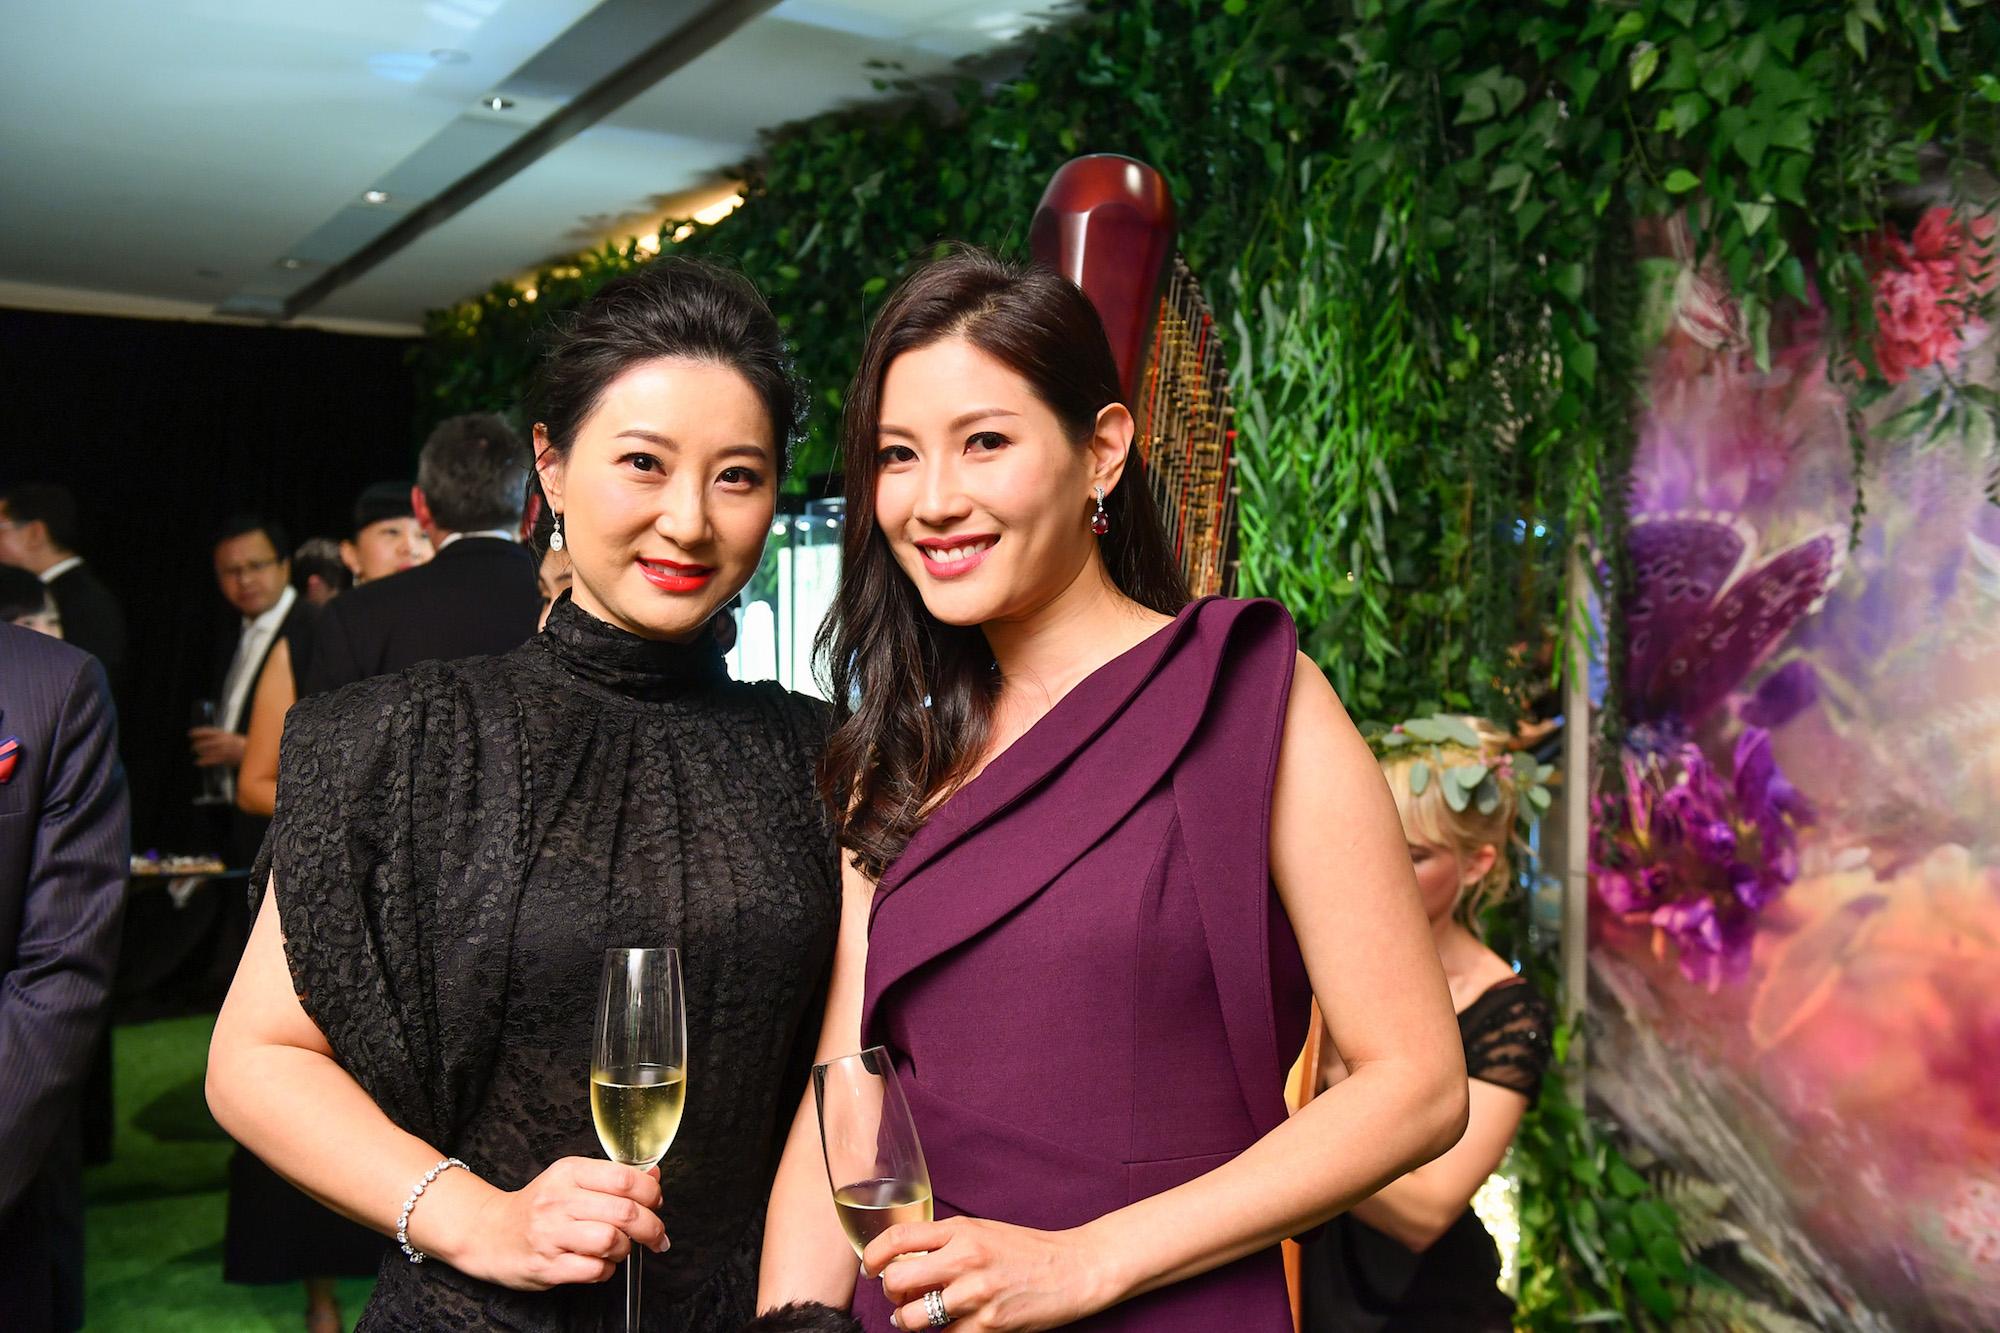 Lillian Lee-Fong, Michelle Kwong